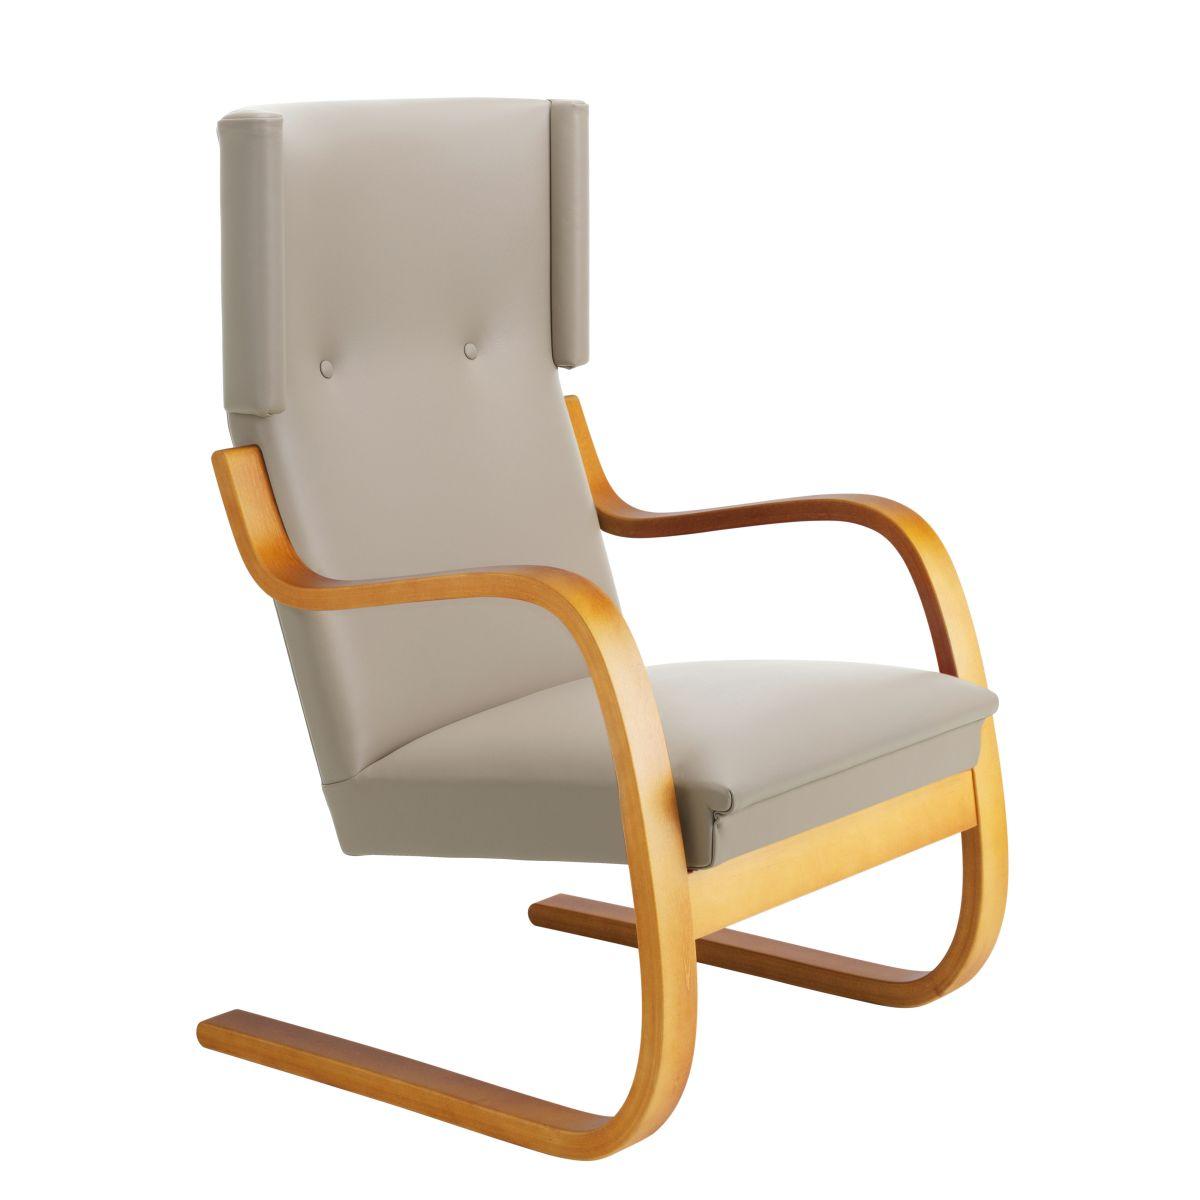 Armchair-401-honey-stain_seat-upholstery-Sörensen-Prestige-beige_F-2912663